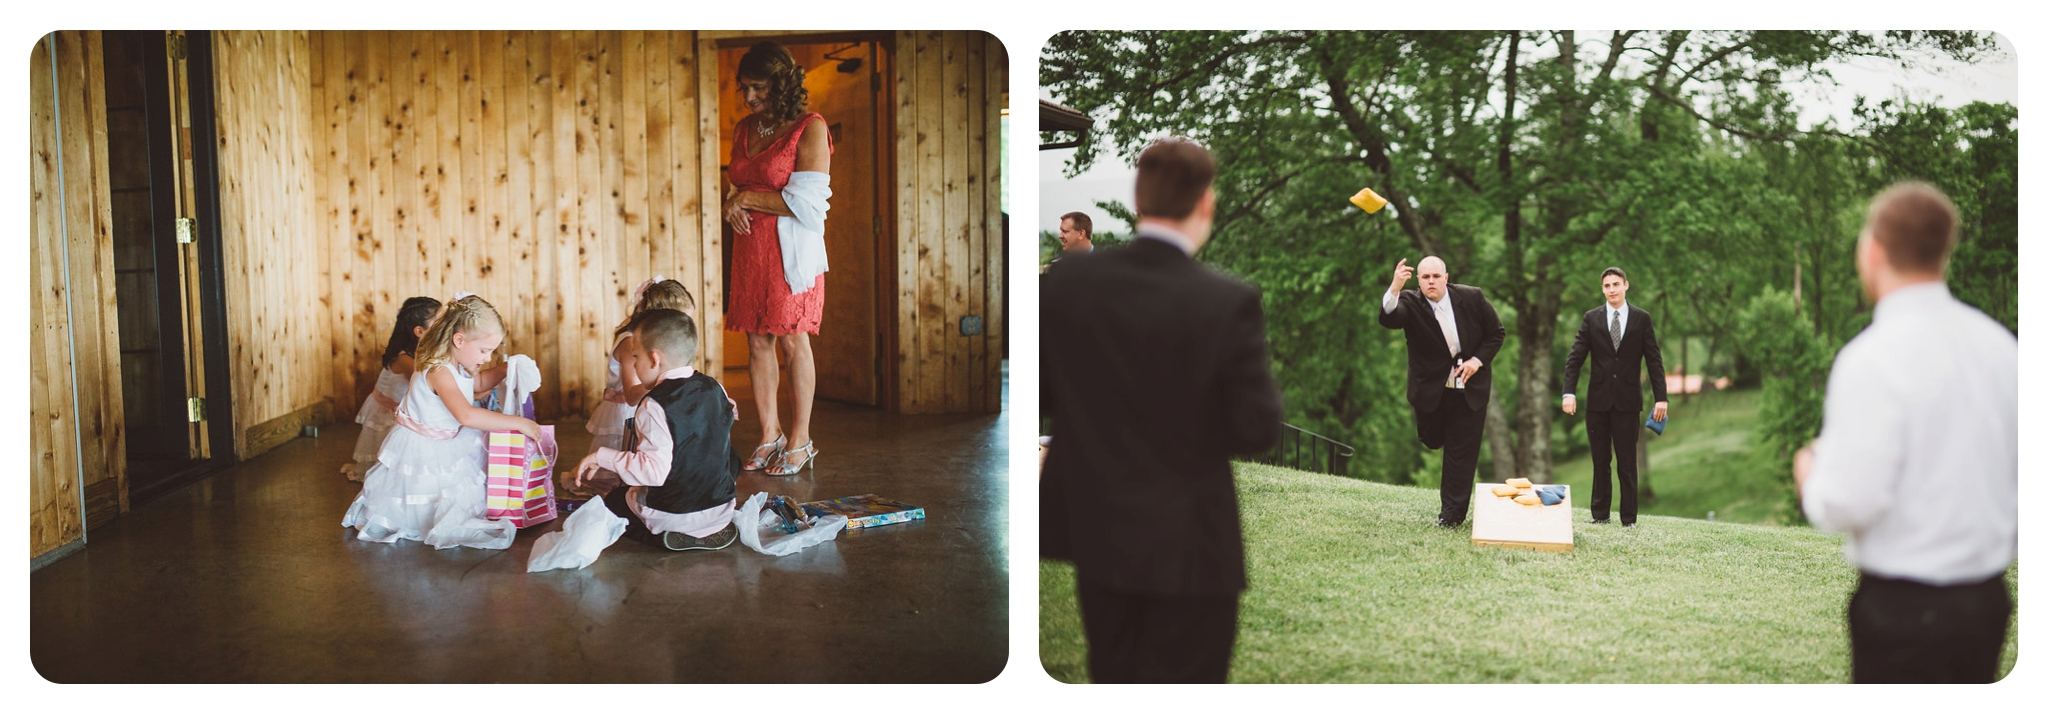 Braeloch-Weddings-Wedding-Photographer-Pat-Cori-Photography-009.jpg